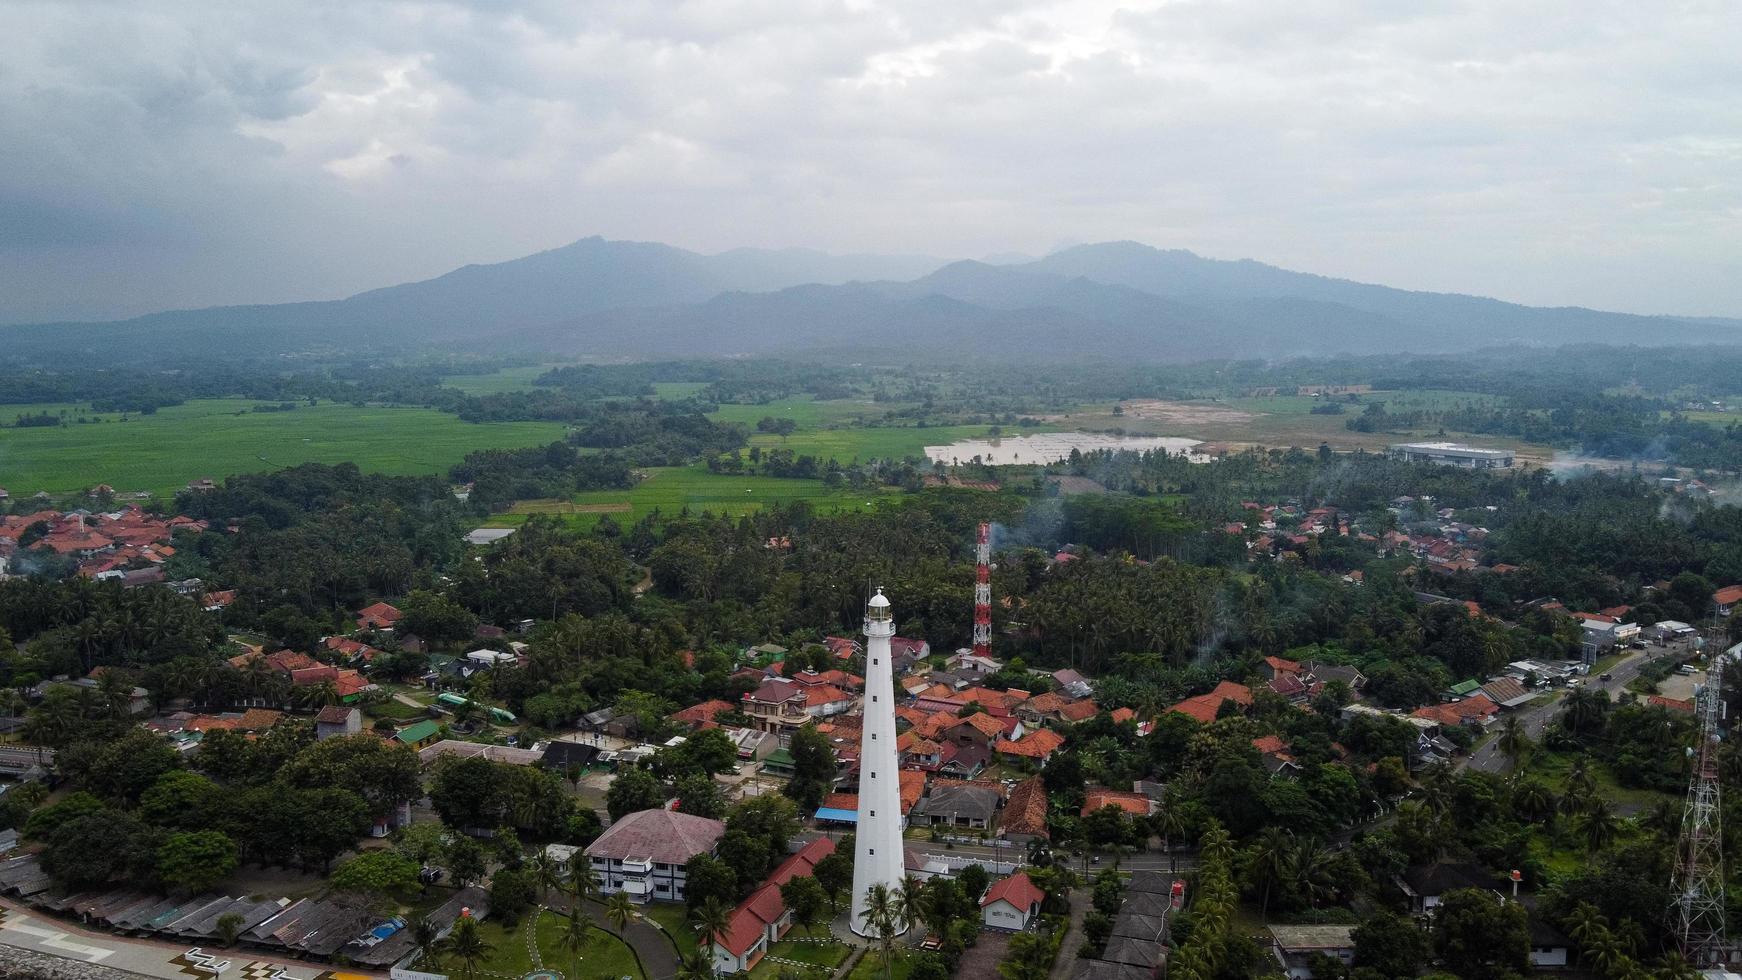 banten, indonesia 2021 - vista aérea del paisaje de la puesta del sol de la roca del mar del faro foto